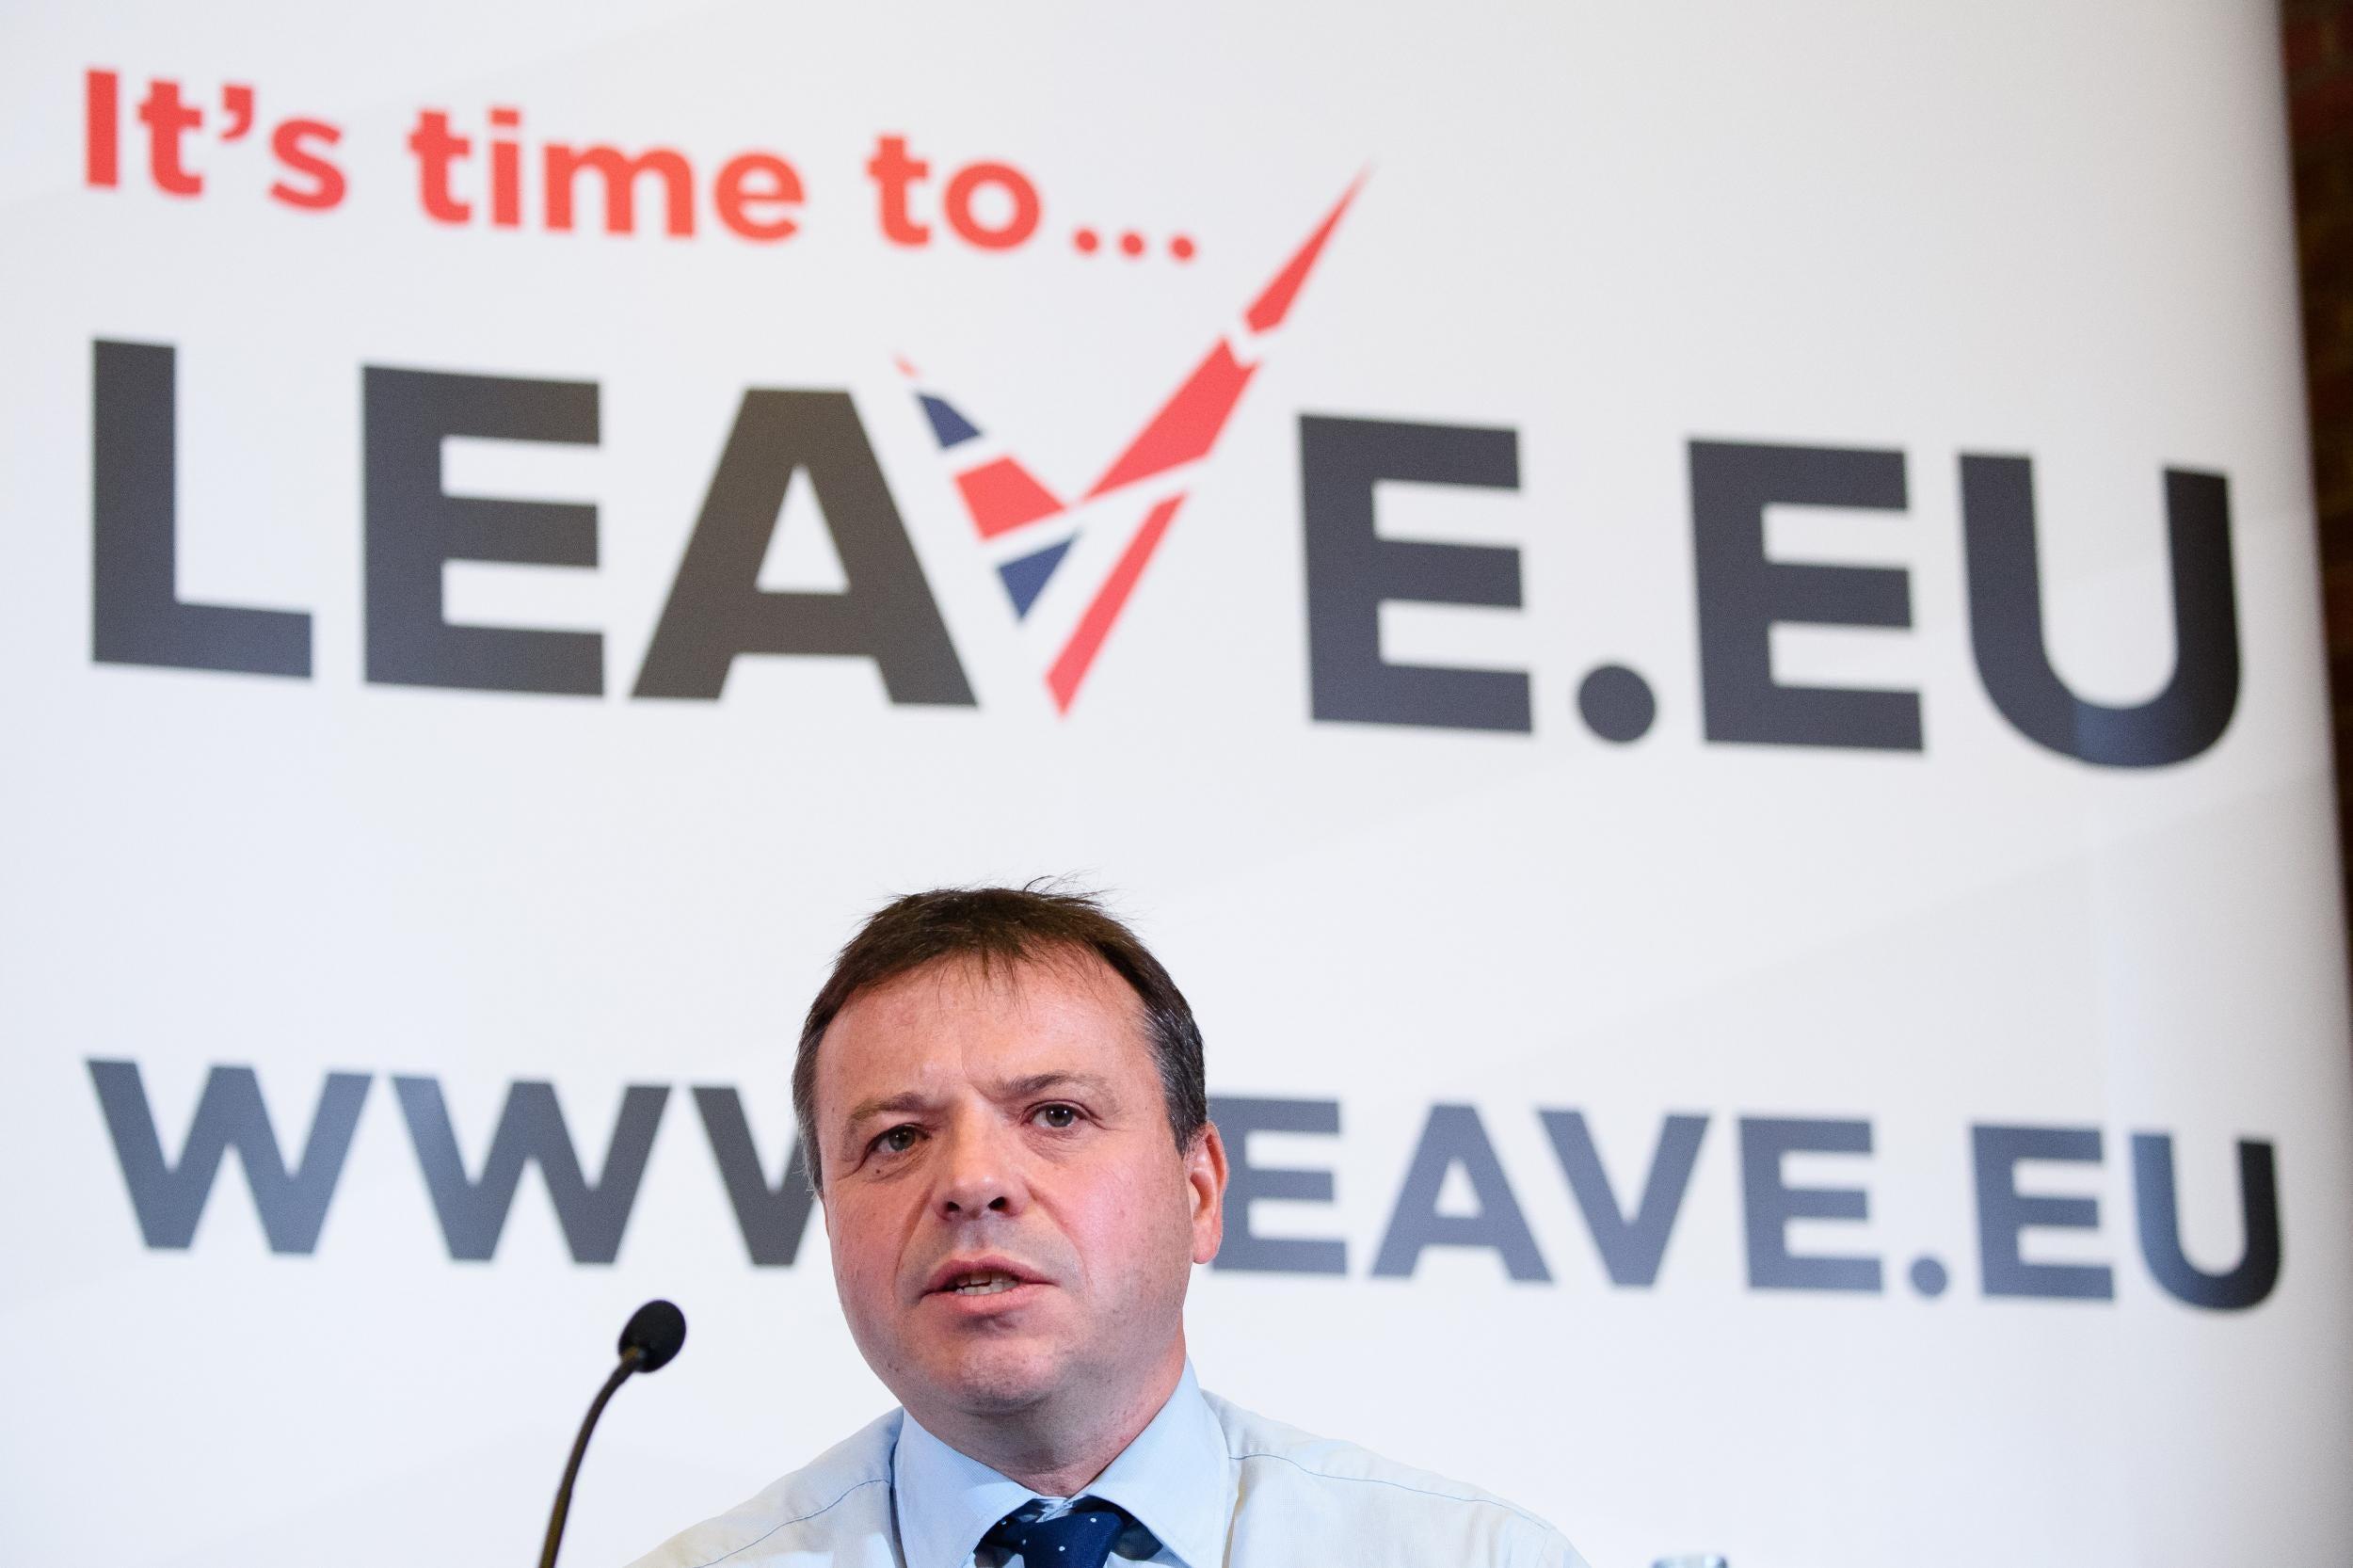 Electoral Commission launches investigation into Leave.EU referendum finances